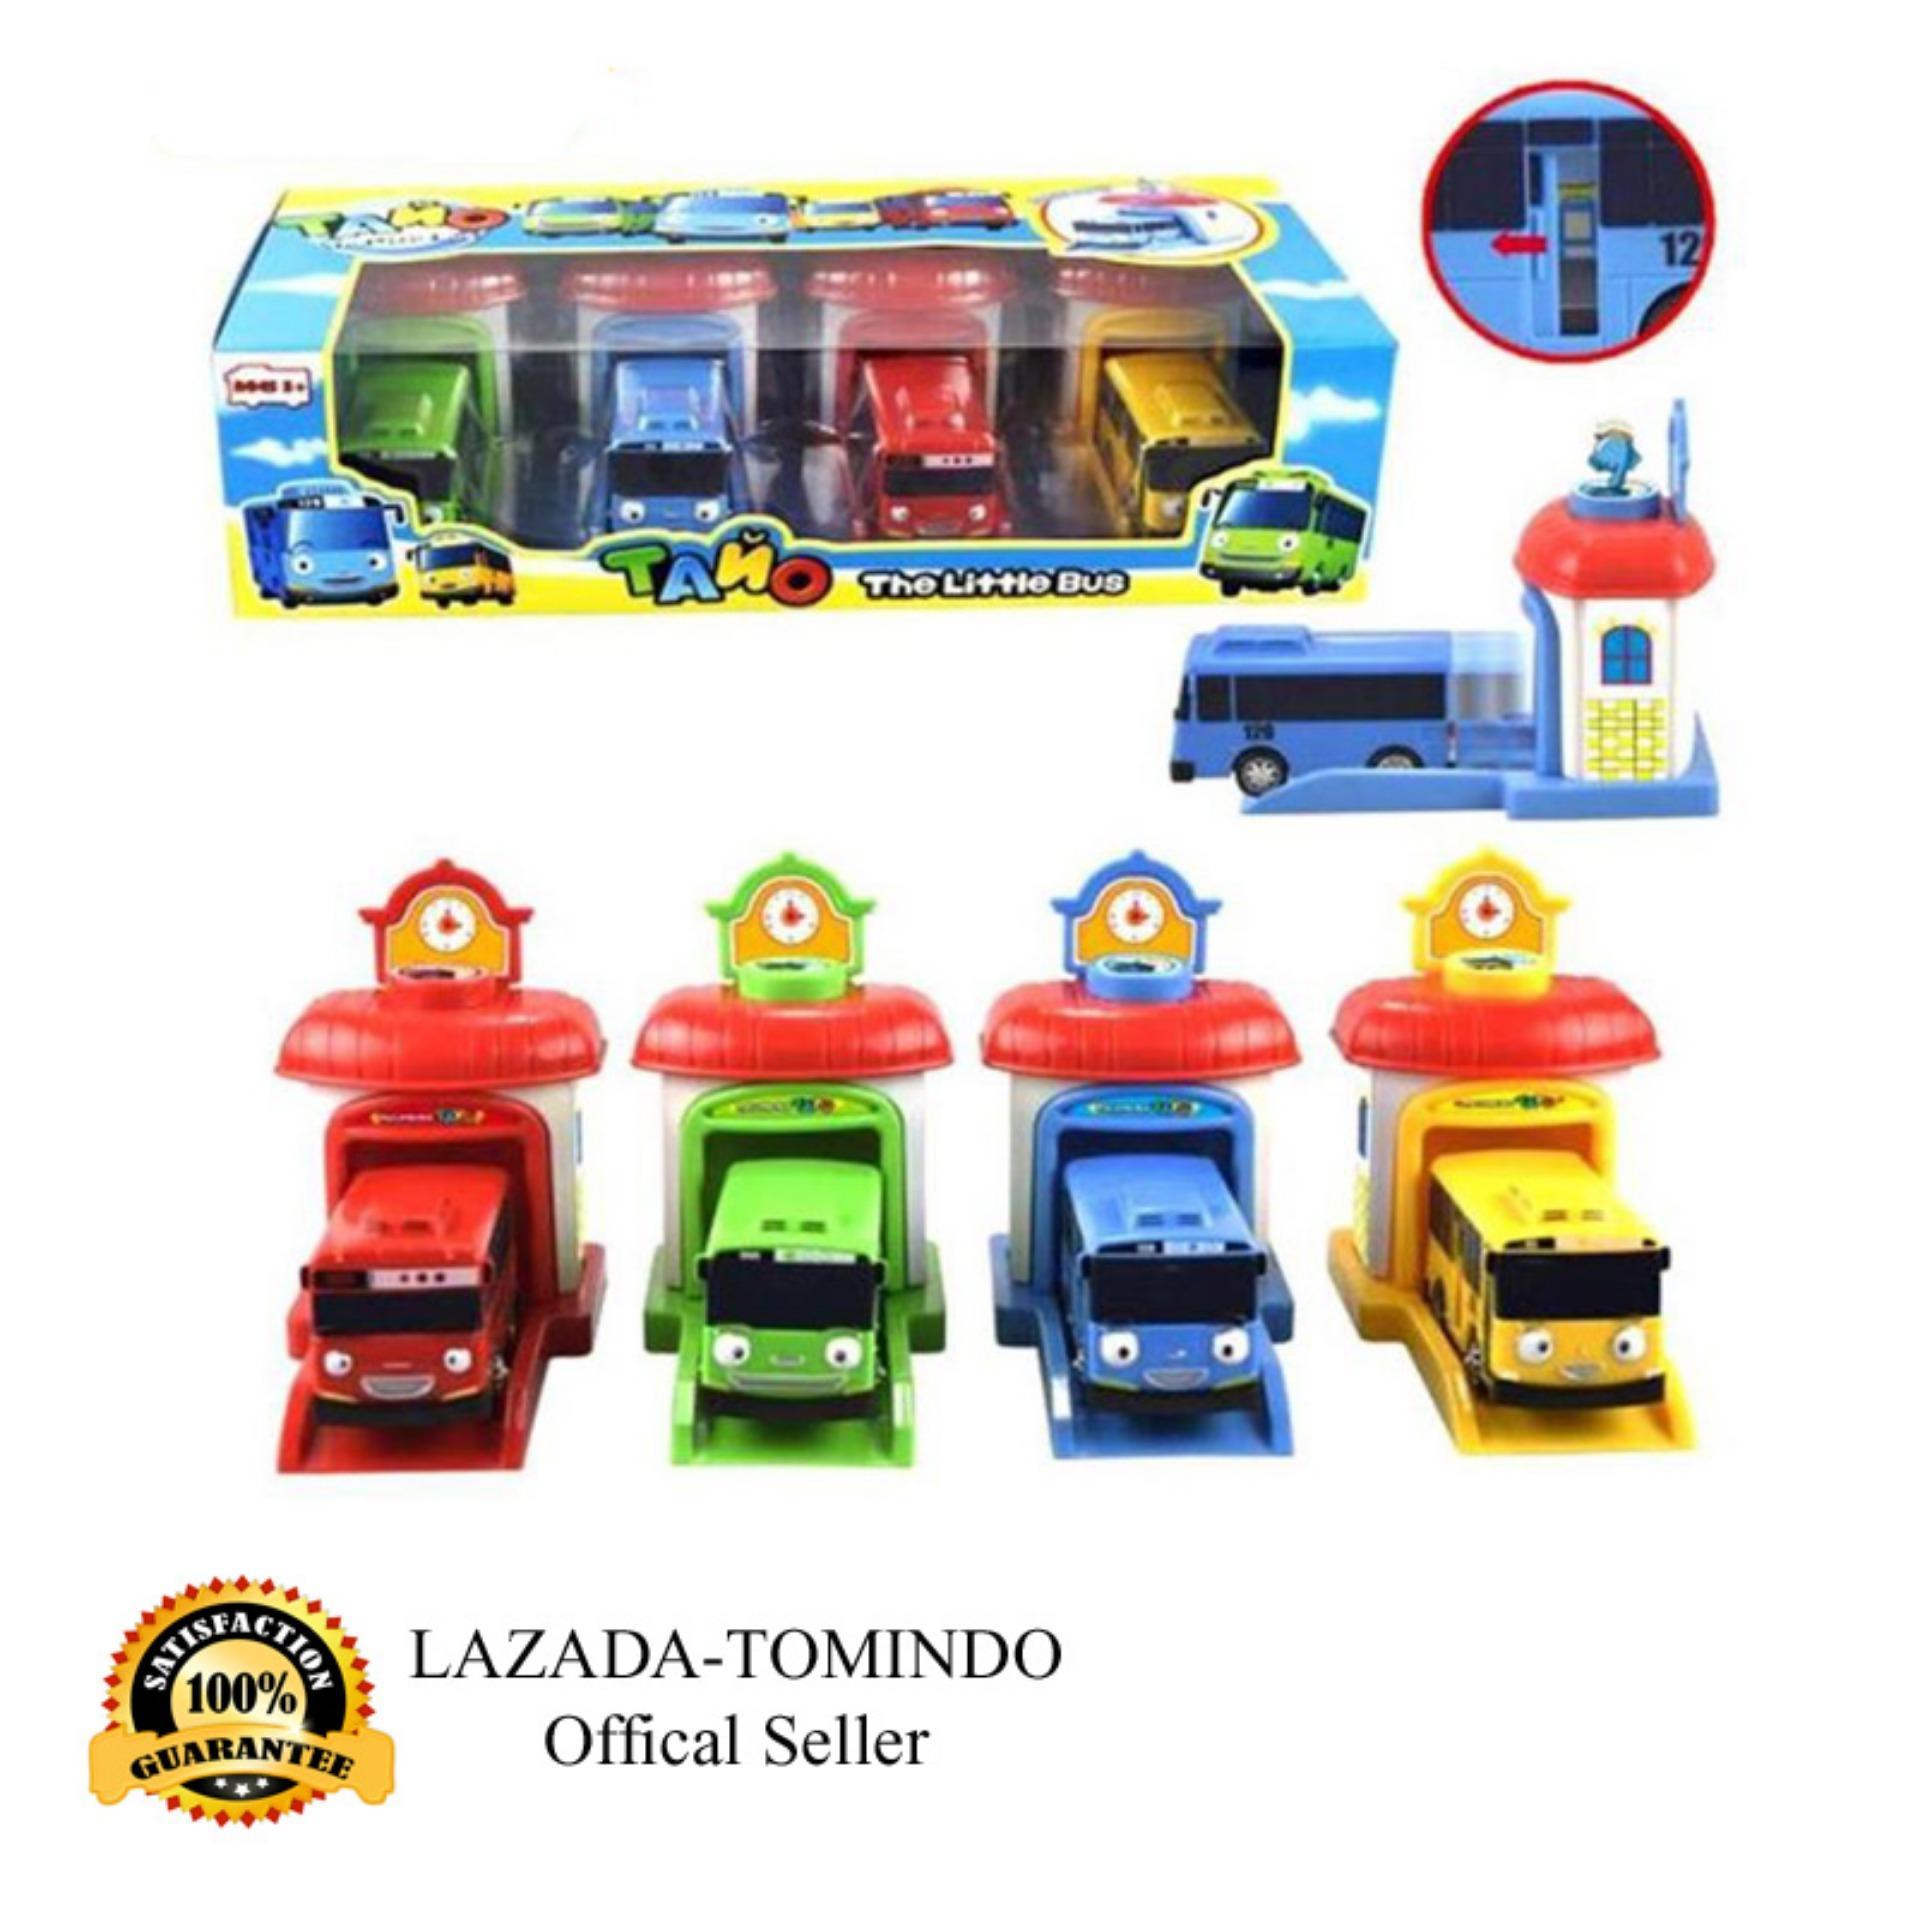 Tomindo Robocar Poli Police Department Xz301 Daftar Harga Mainan 1 Set Poly Demo Grabtag Source Toys